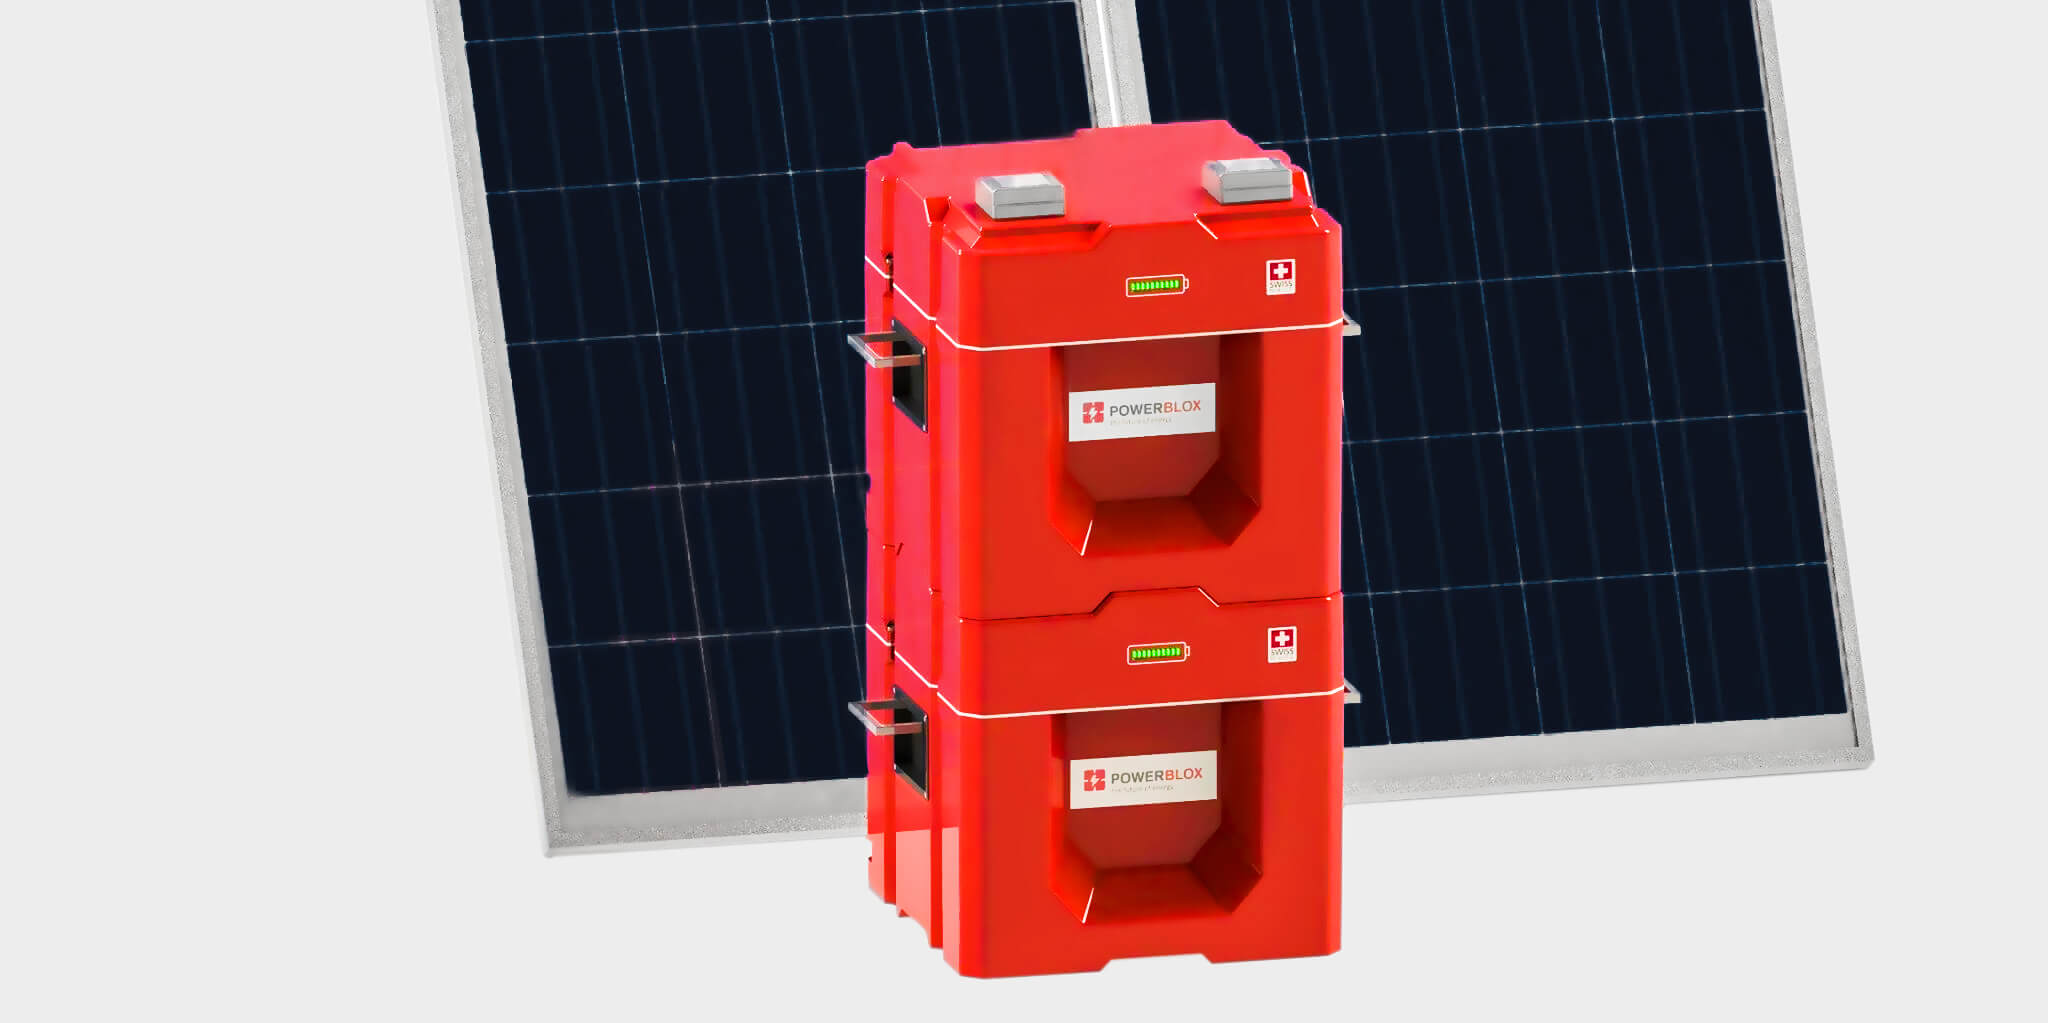 Stäubli_PowerBlox_Solar Staubli And Power-Blox Partner On Energy Storage